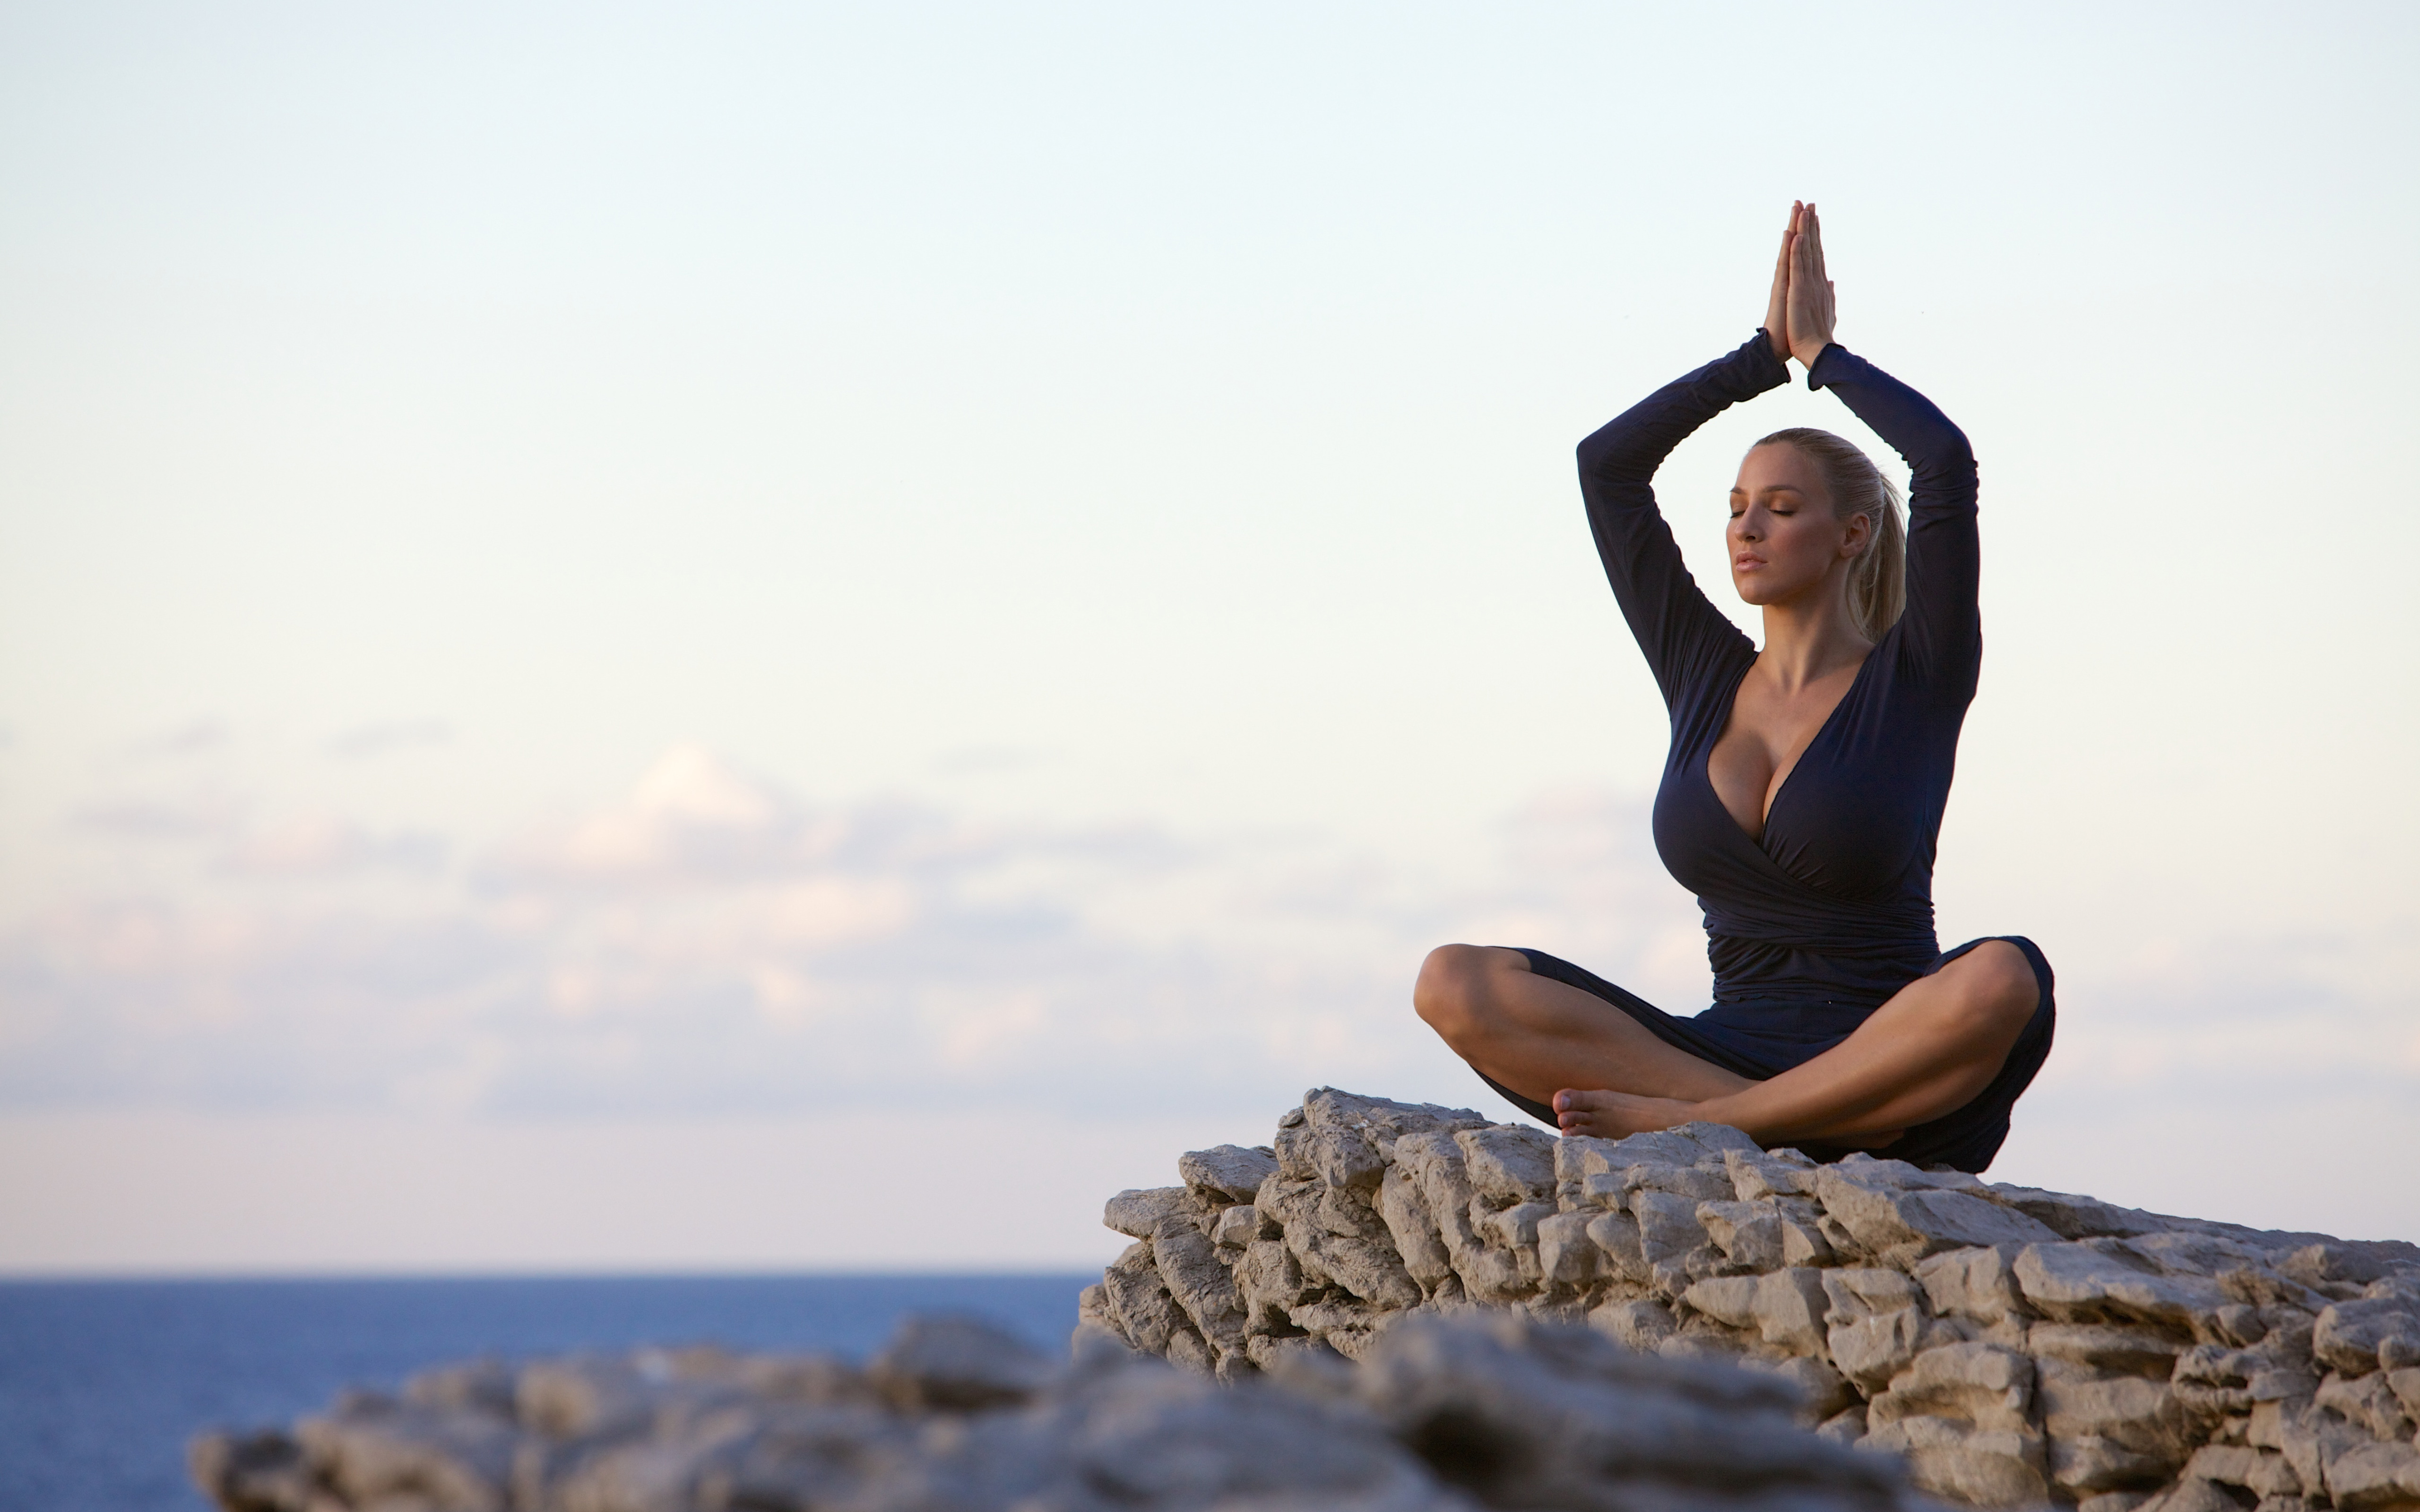 Yoga for stamina and flexibility